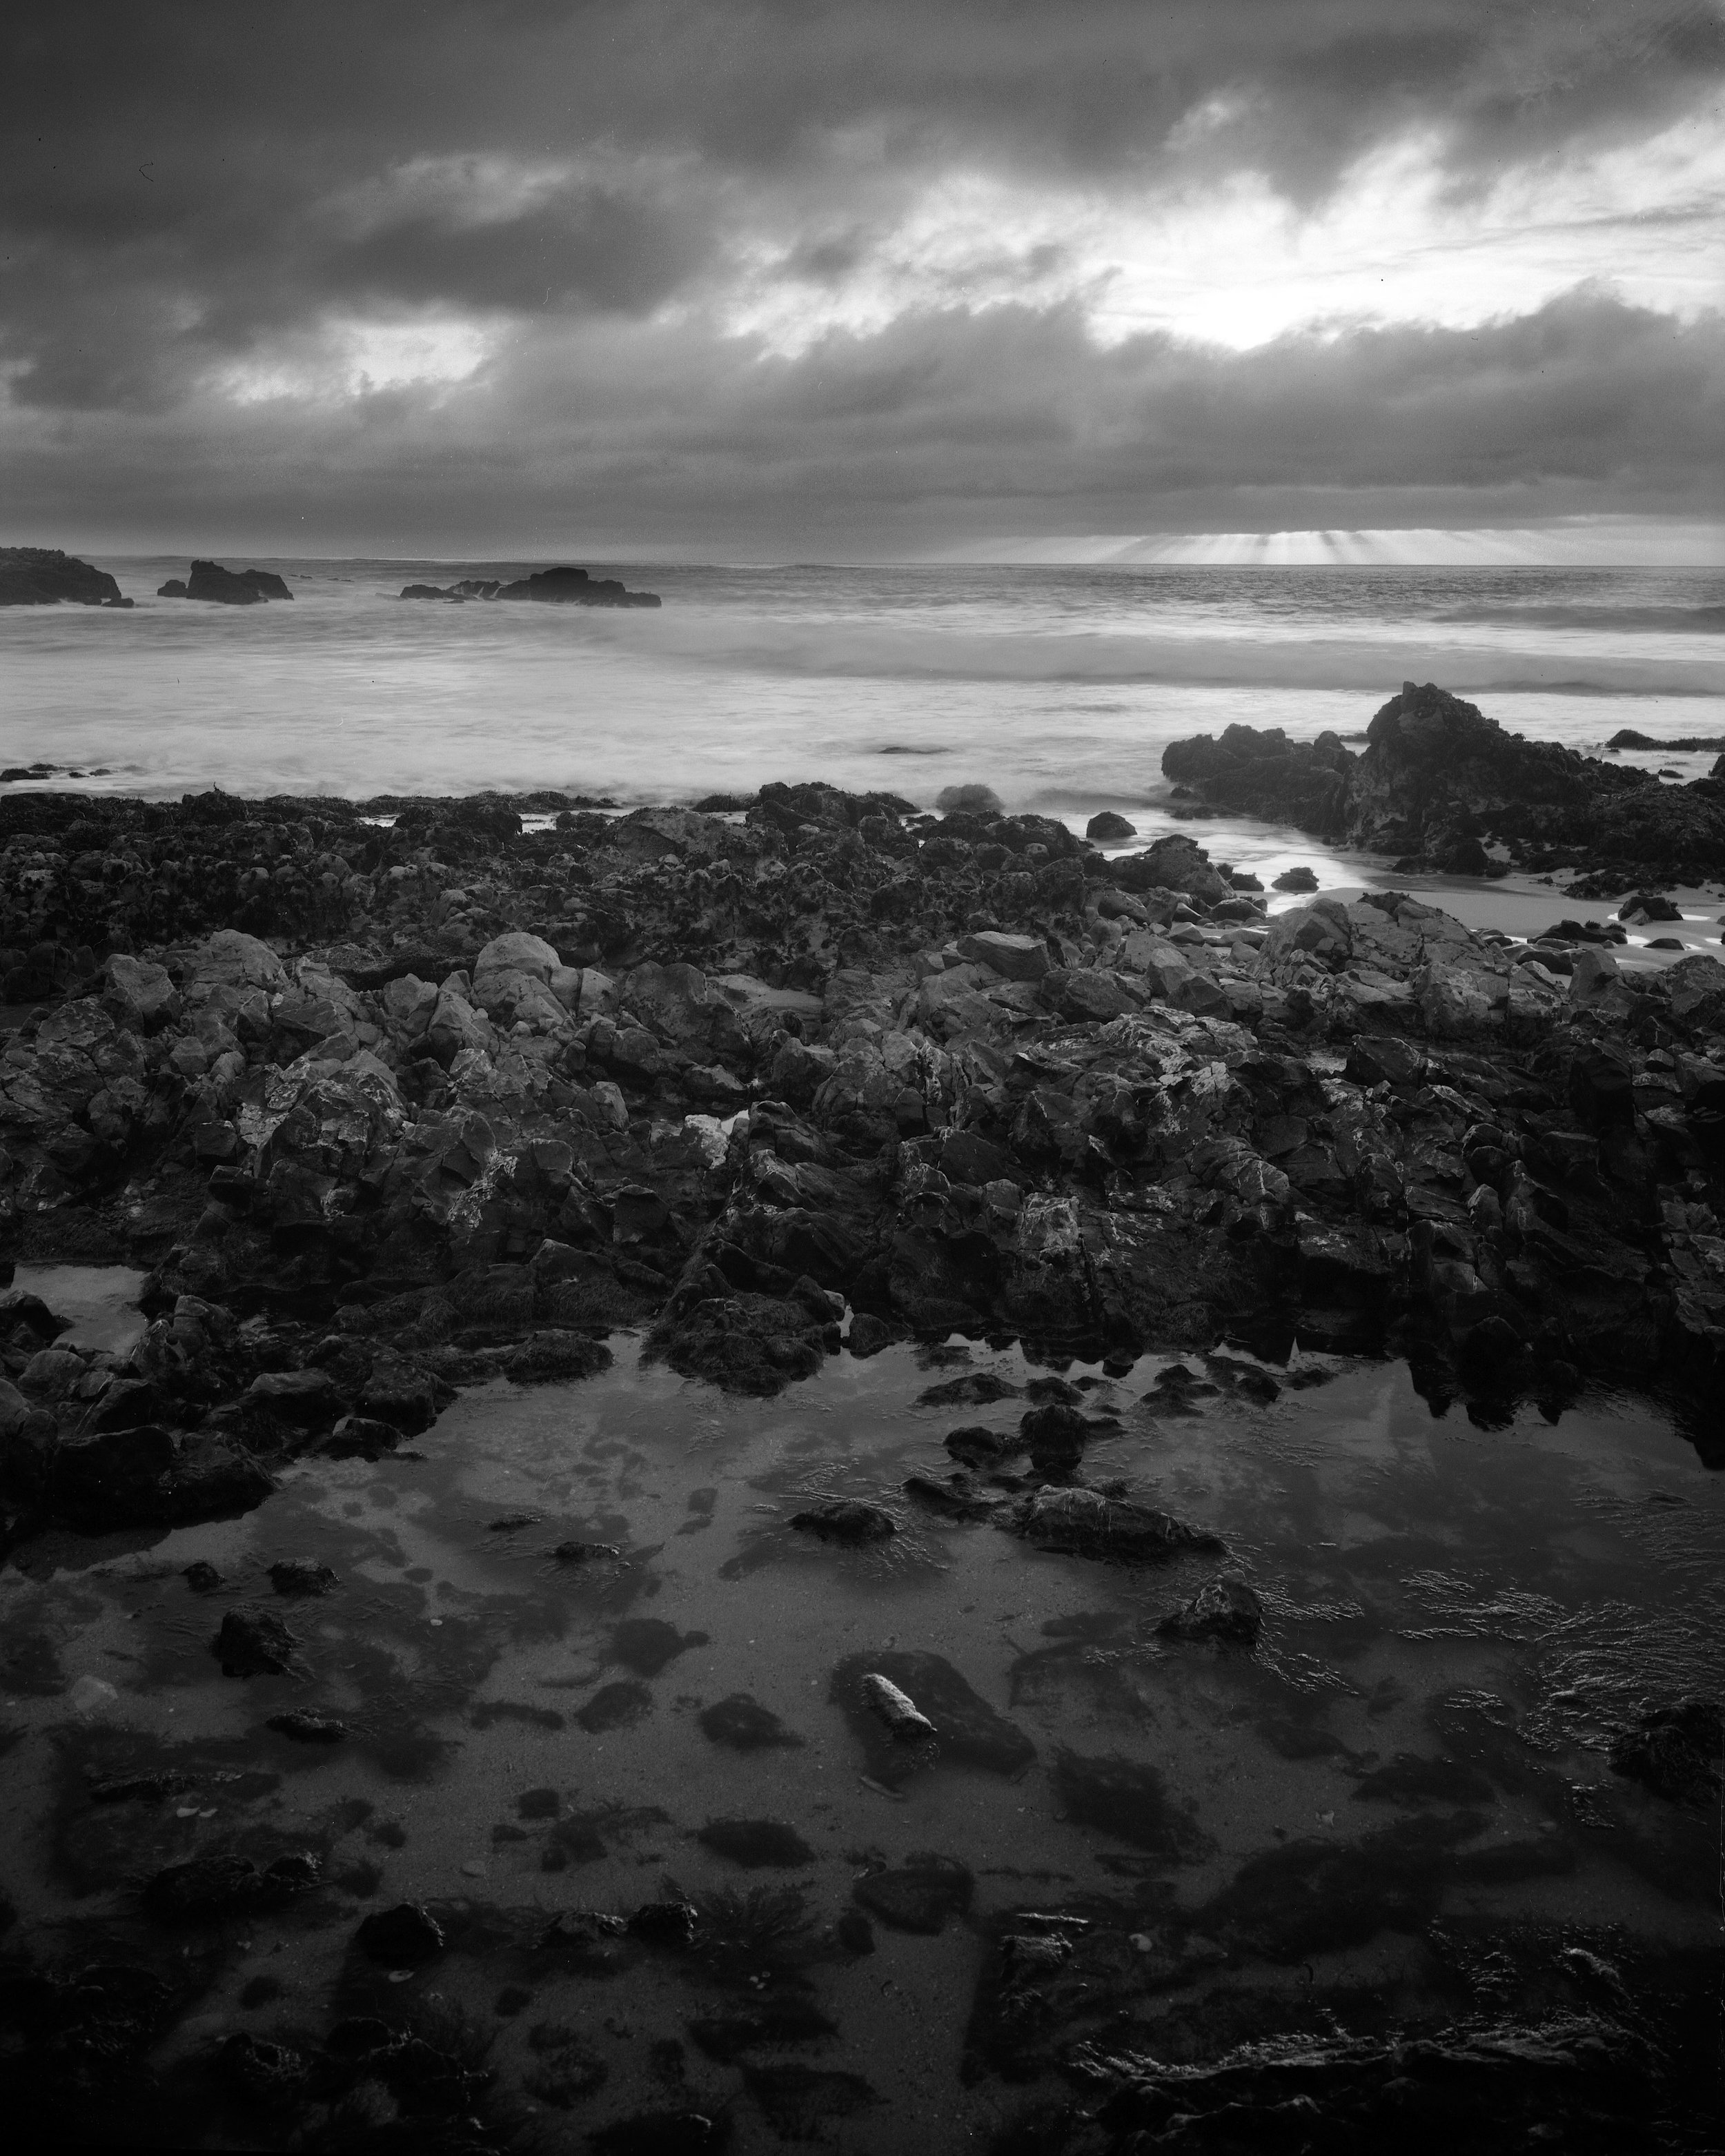 Sunset over Tidepool.Nagaoka 4x5, Fujinon 125mm f/5.6, Ilford FP4+ 125